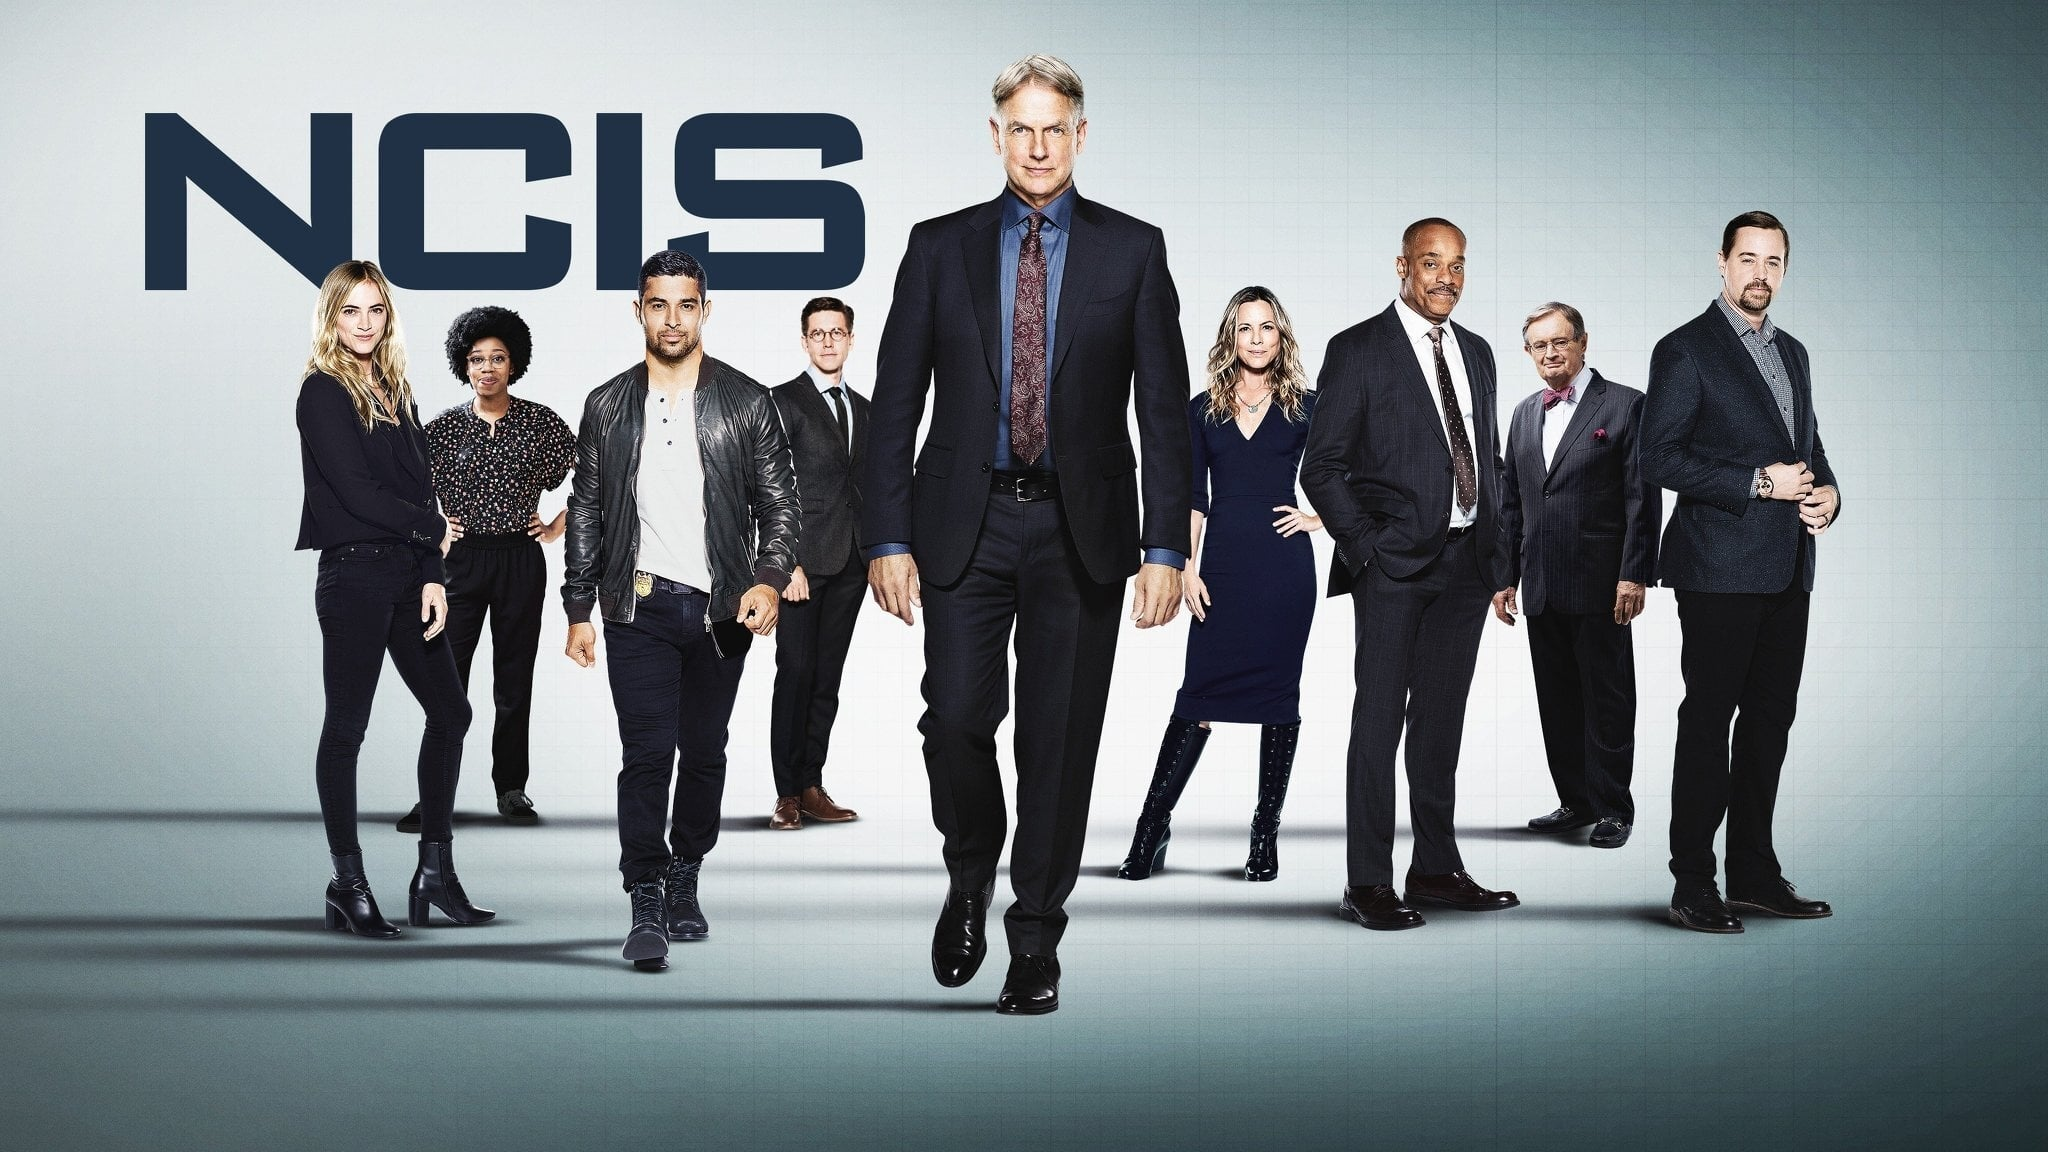 NCIS - Season 18 Episode 6